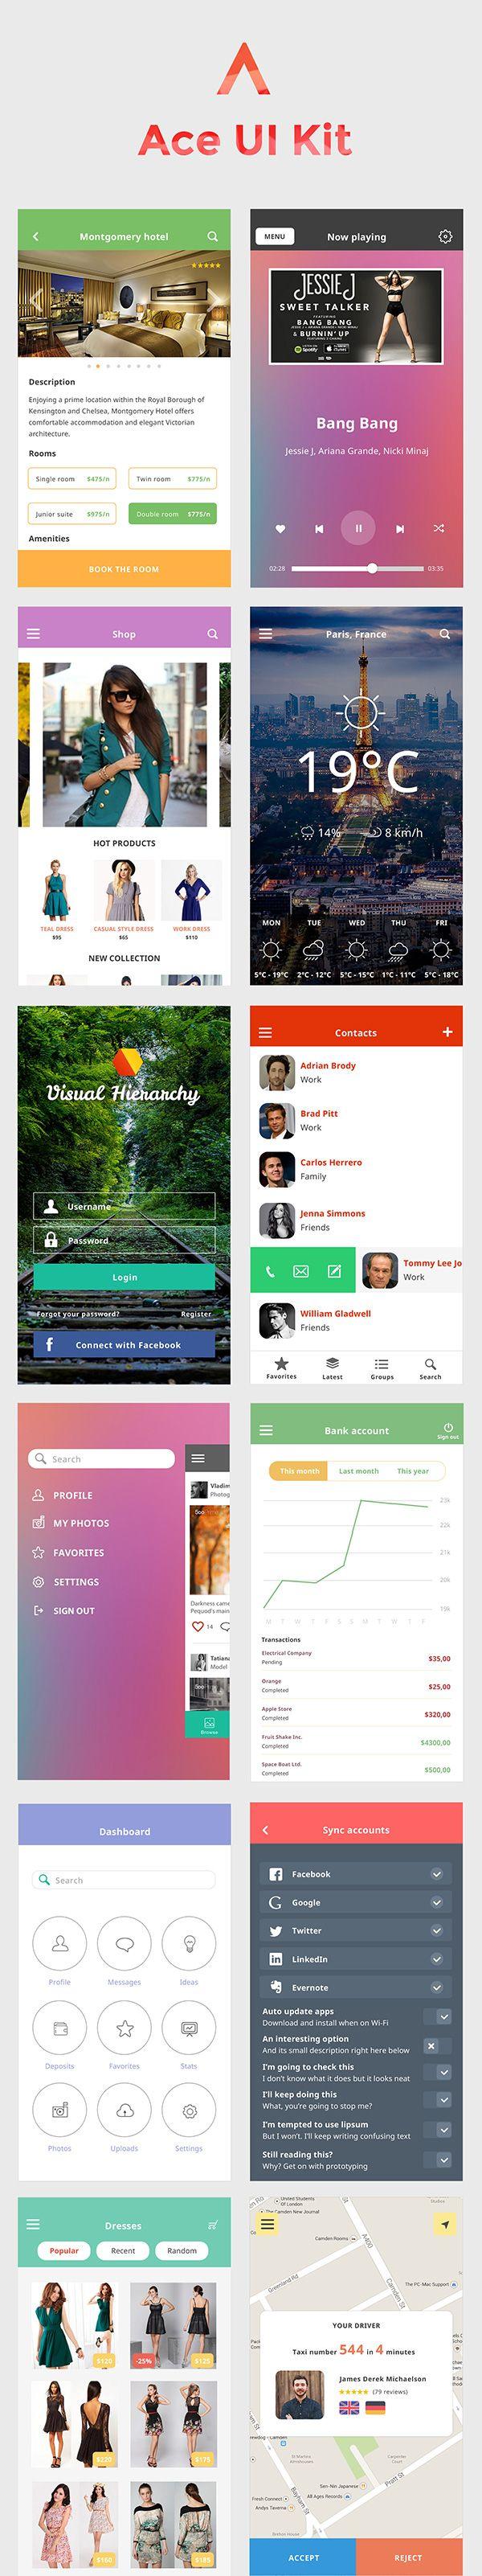 Ace iOS8 Mobile UI Kit Freebie | GraphicBurger